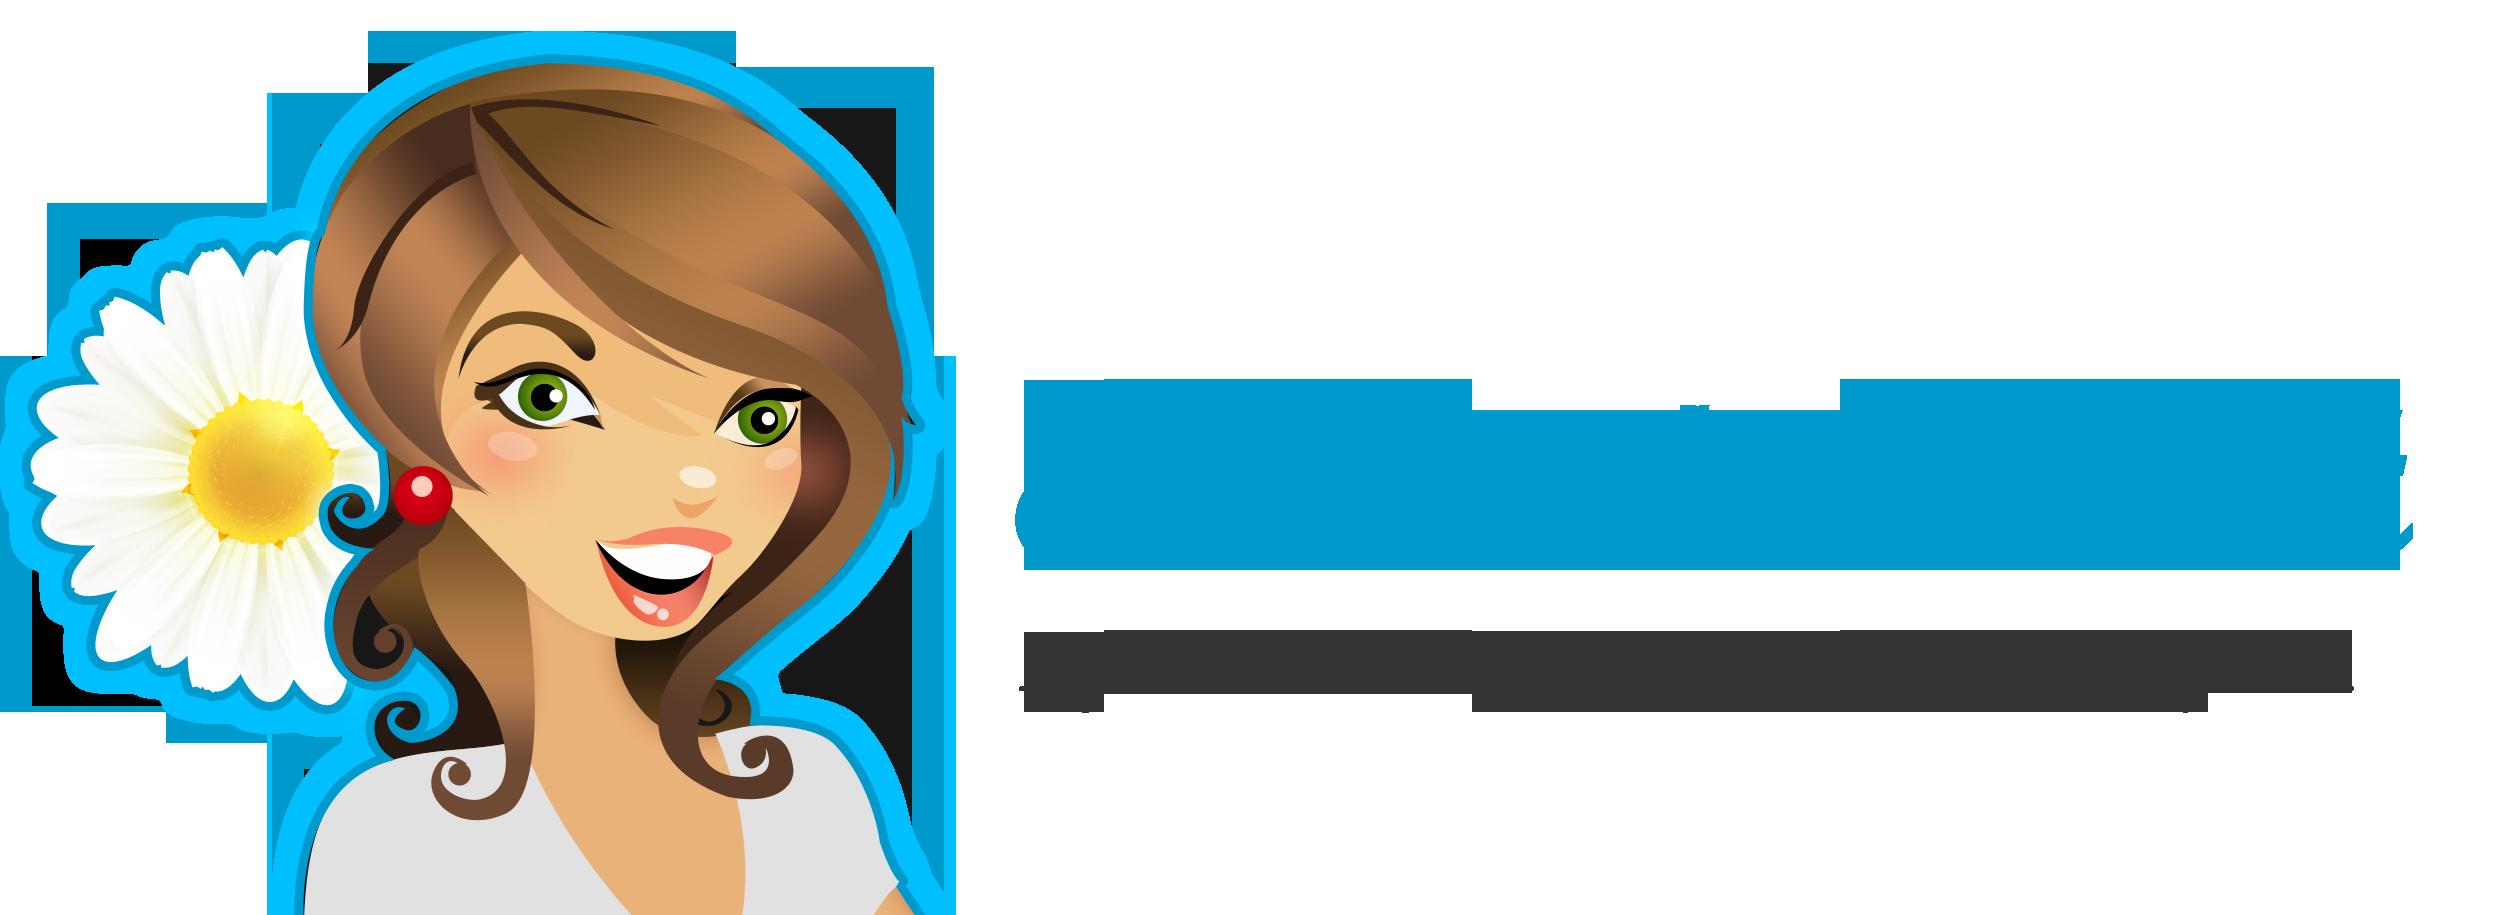 emmascredit.cz logo